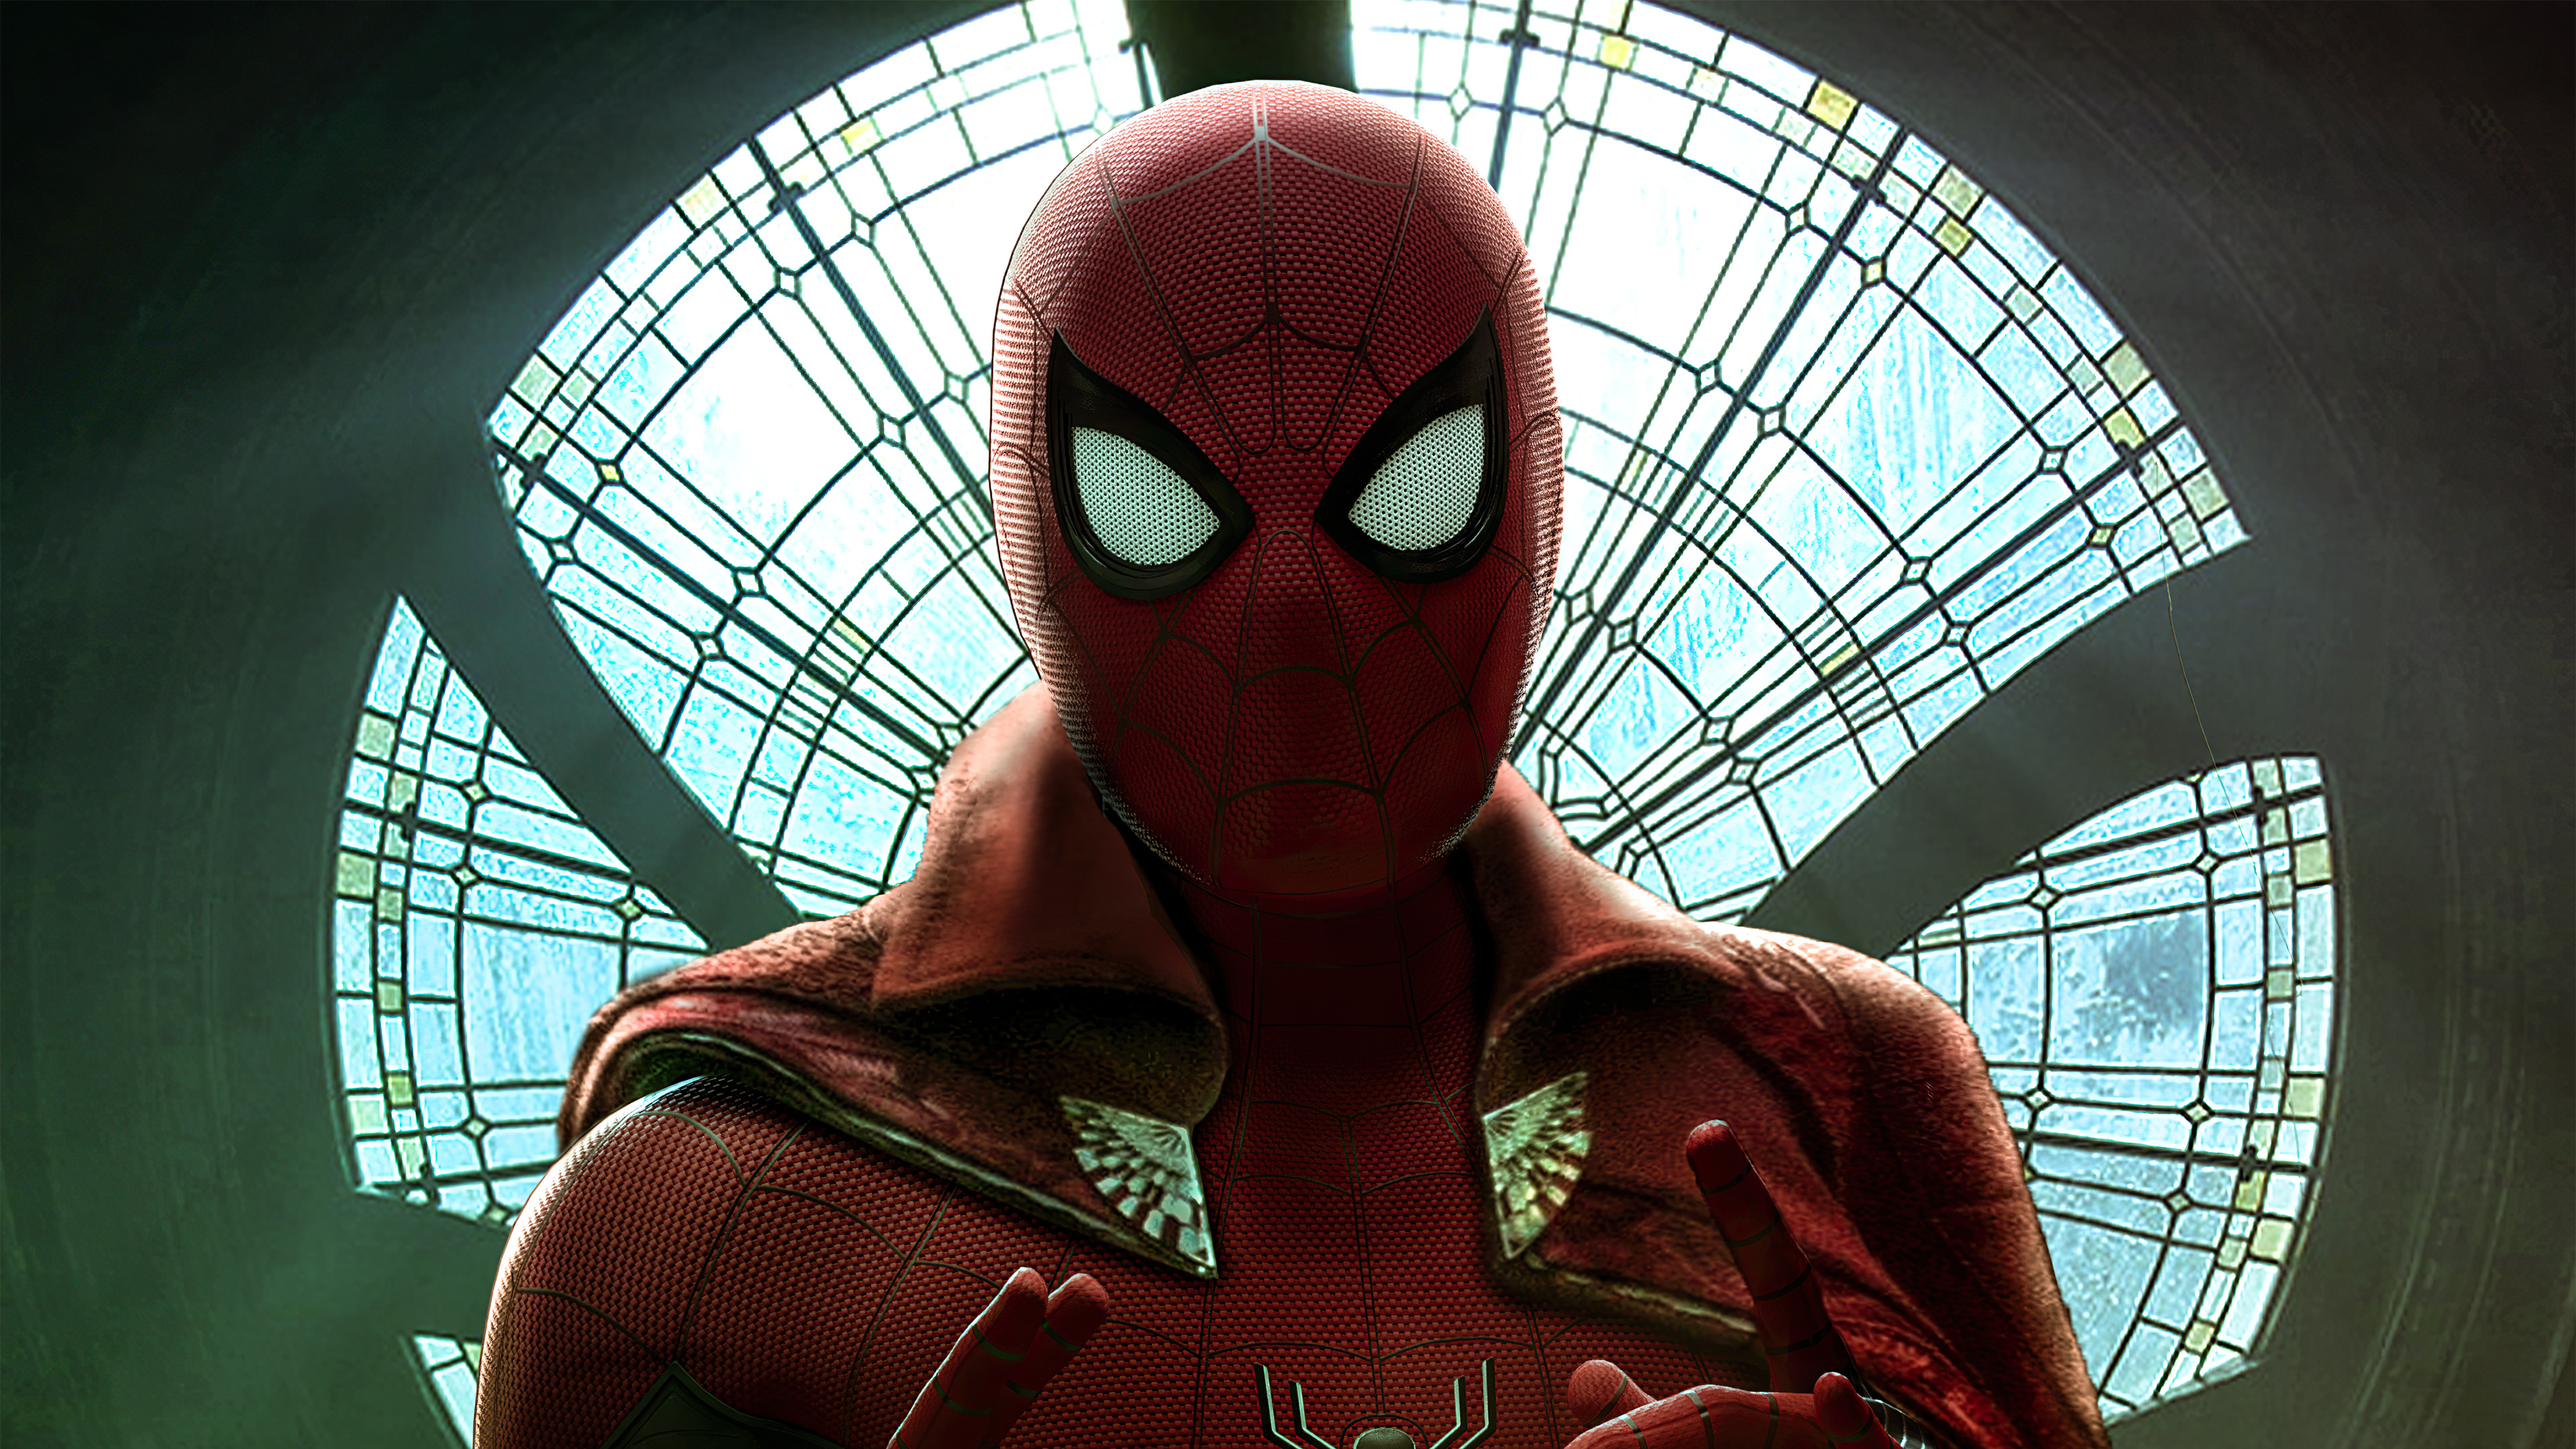 spiderman-web-suit-4k-od.jpg